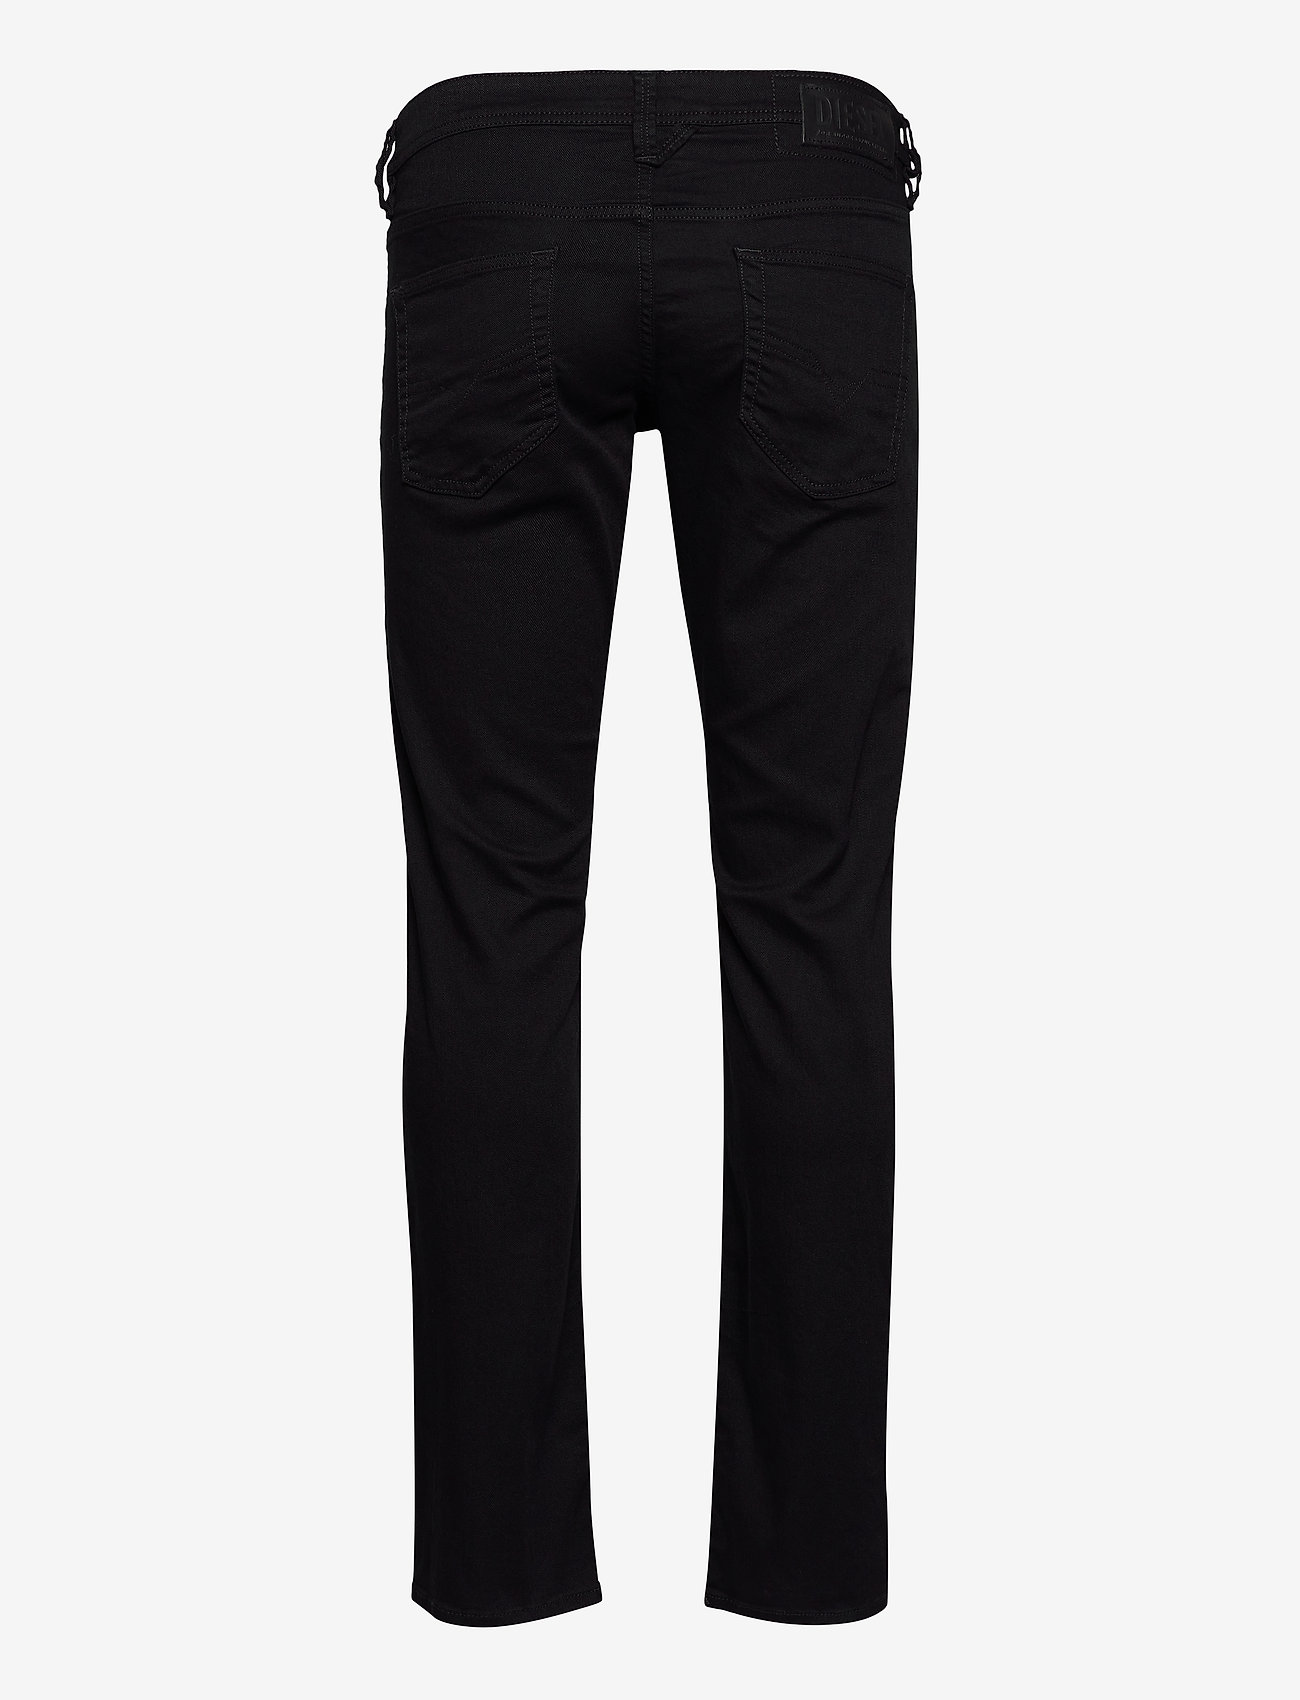 Diesel Men - LARKEE-X L.32 TROUSERS - regular jeans - black/denim - 1